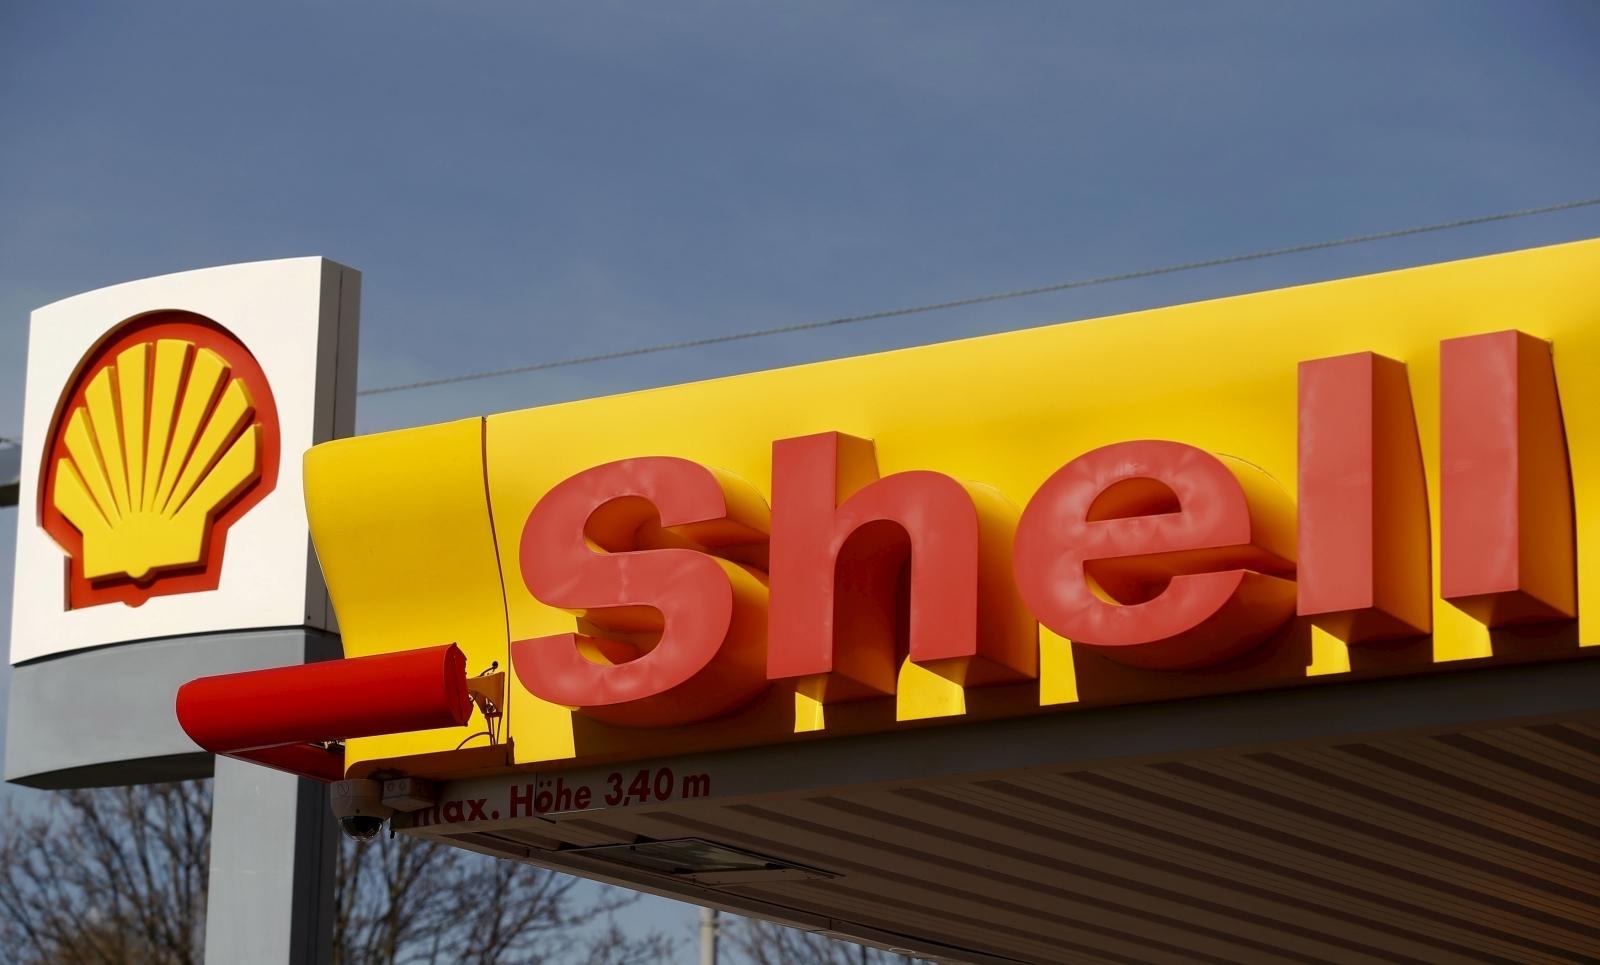 Shell service station